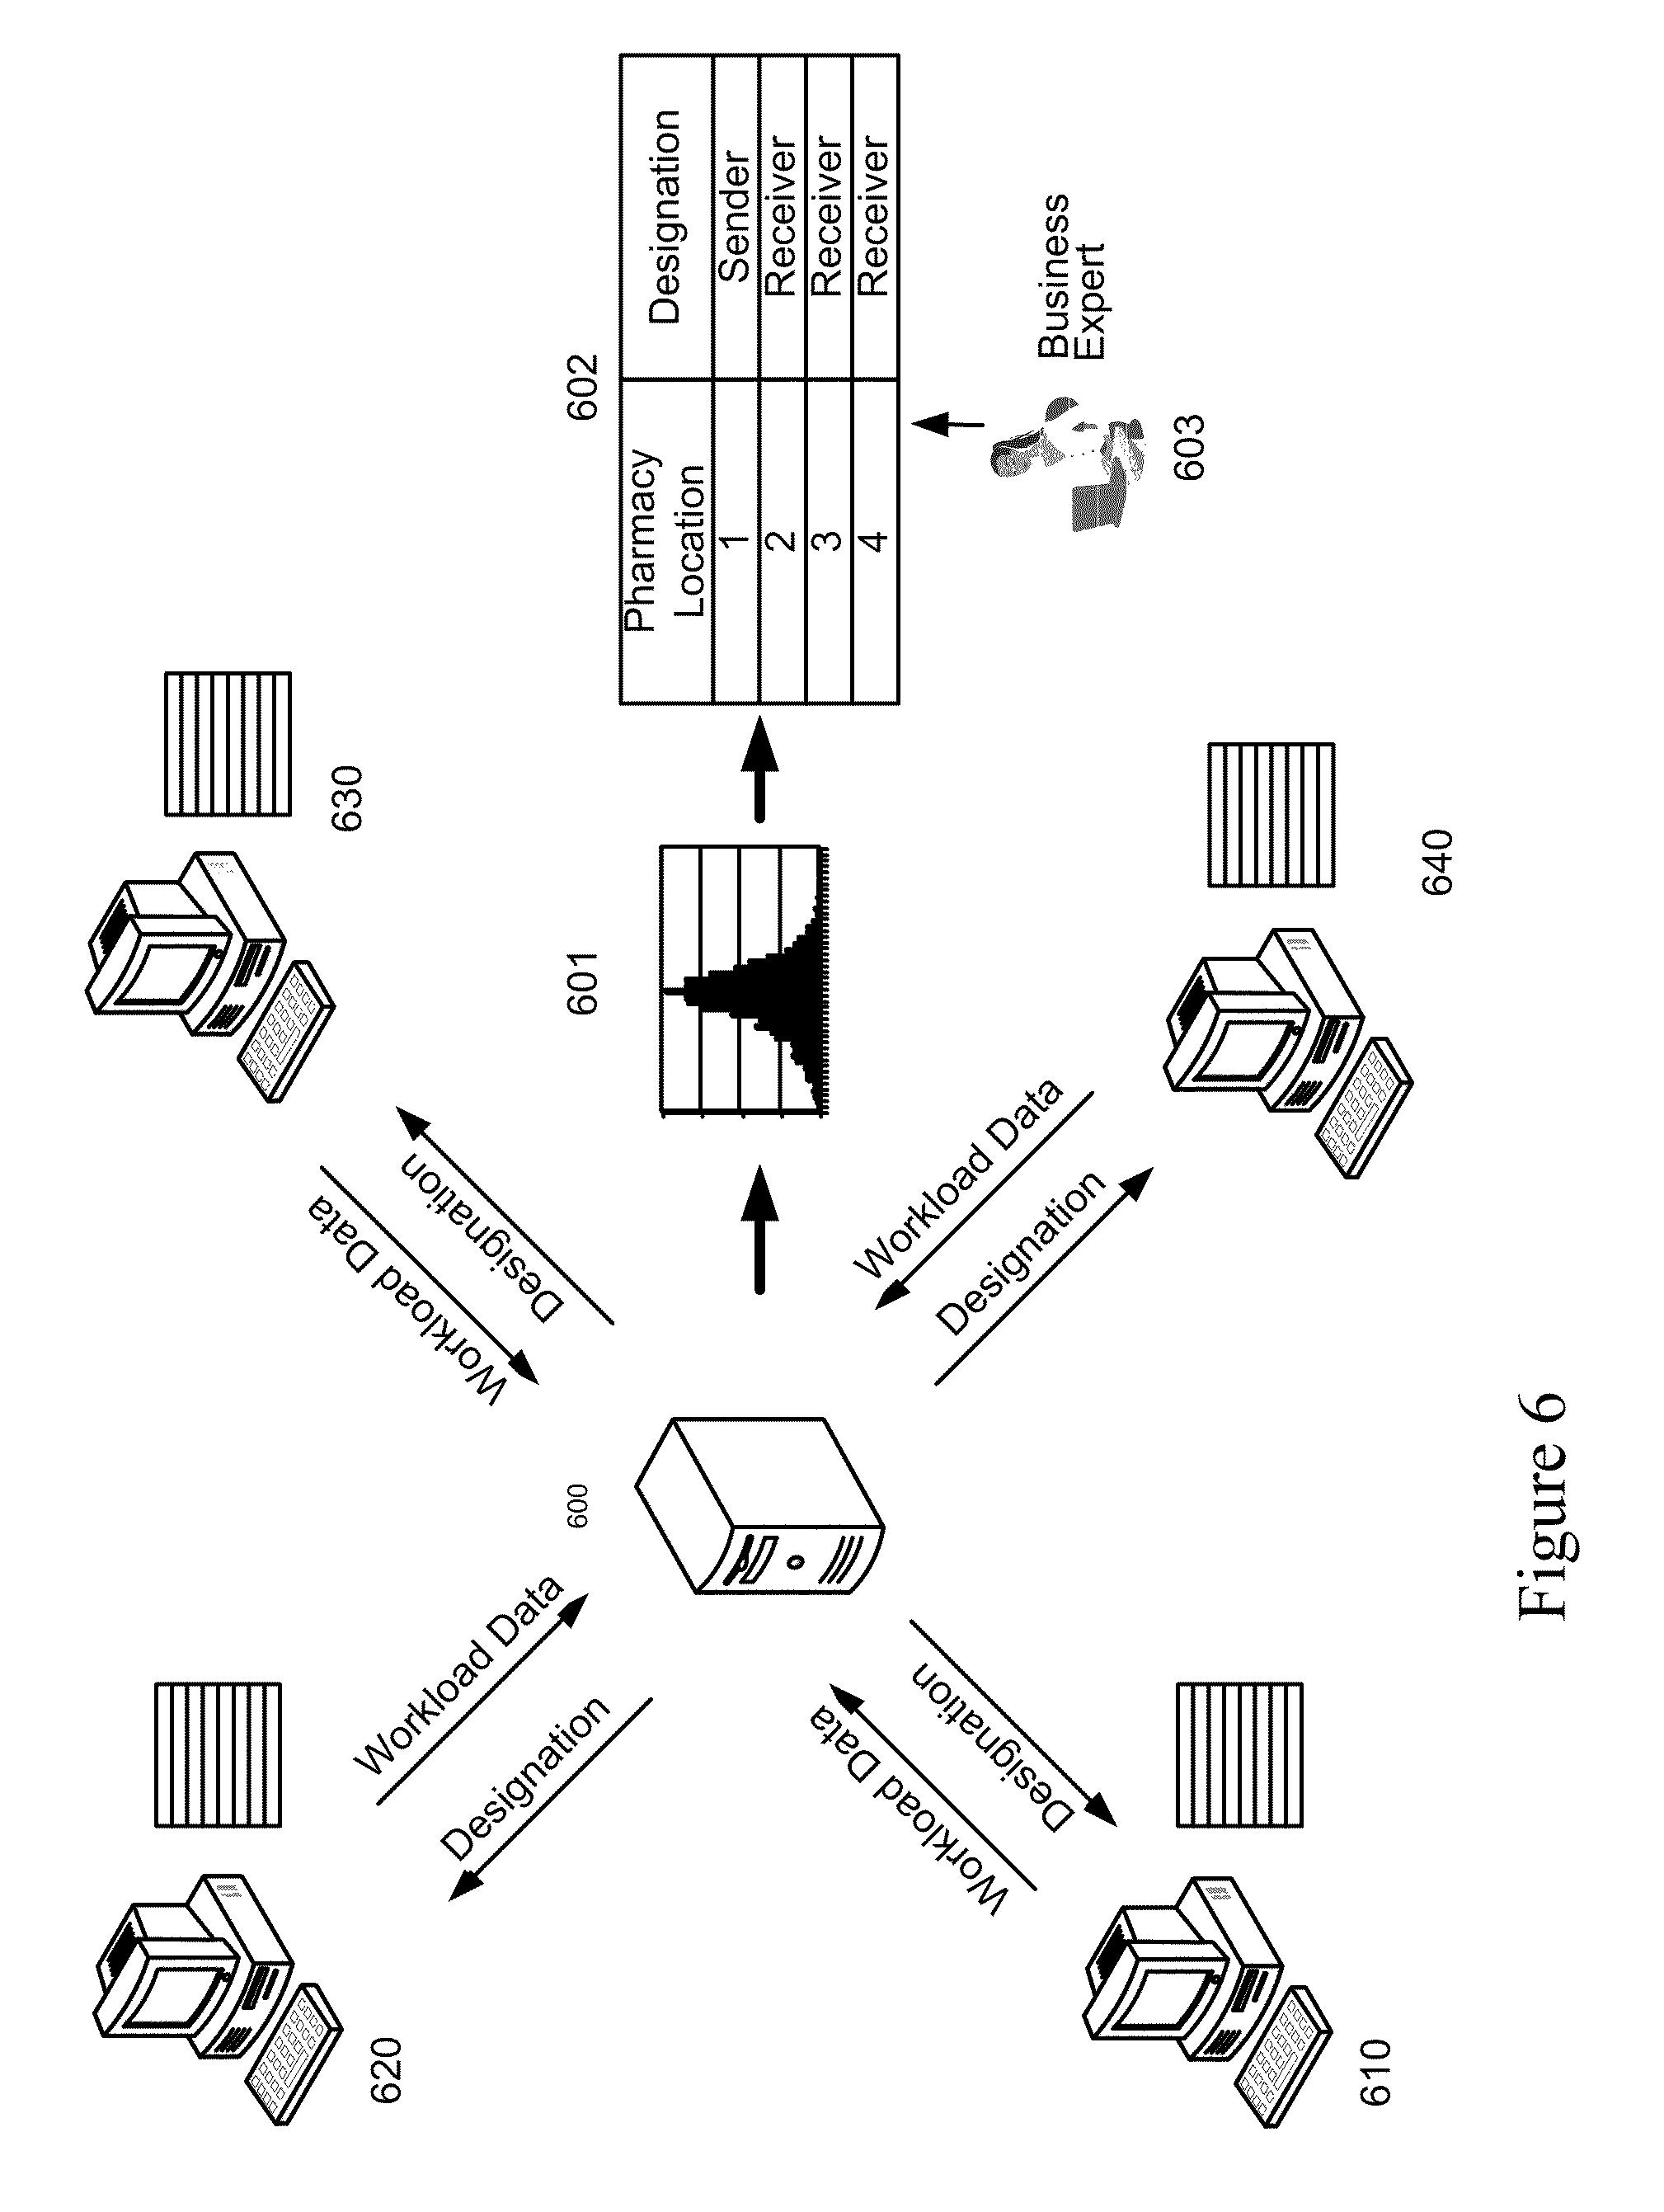 Goodall 11 610 Wiring Diagram Caterpillar D8k For Parts Diagrams Engine Schematic Start